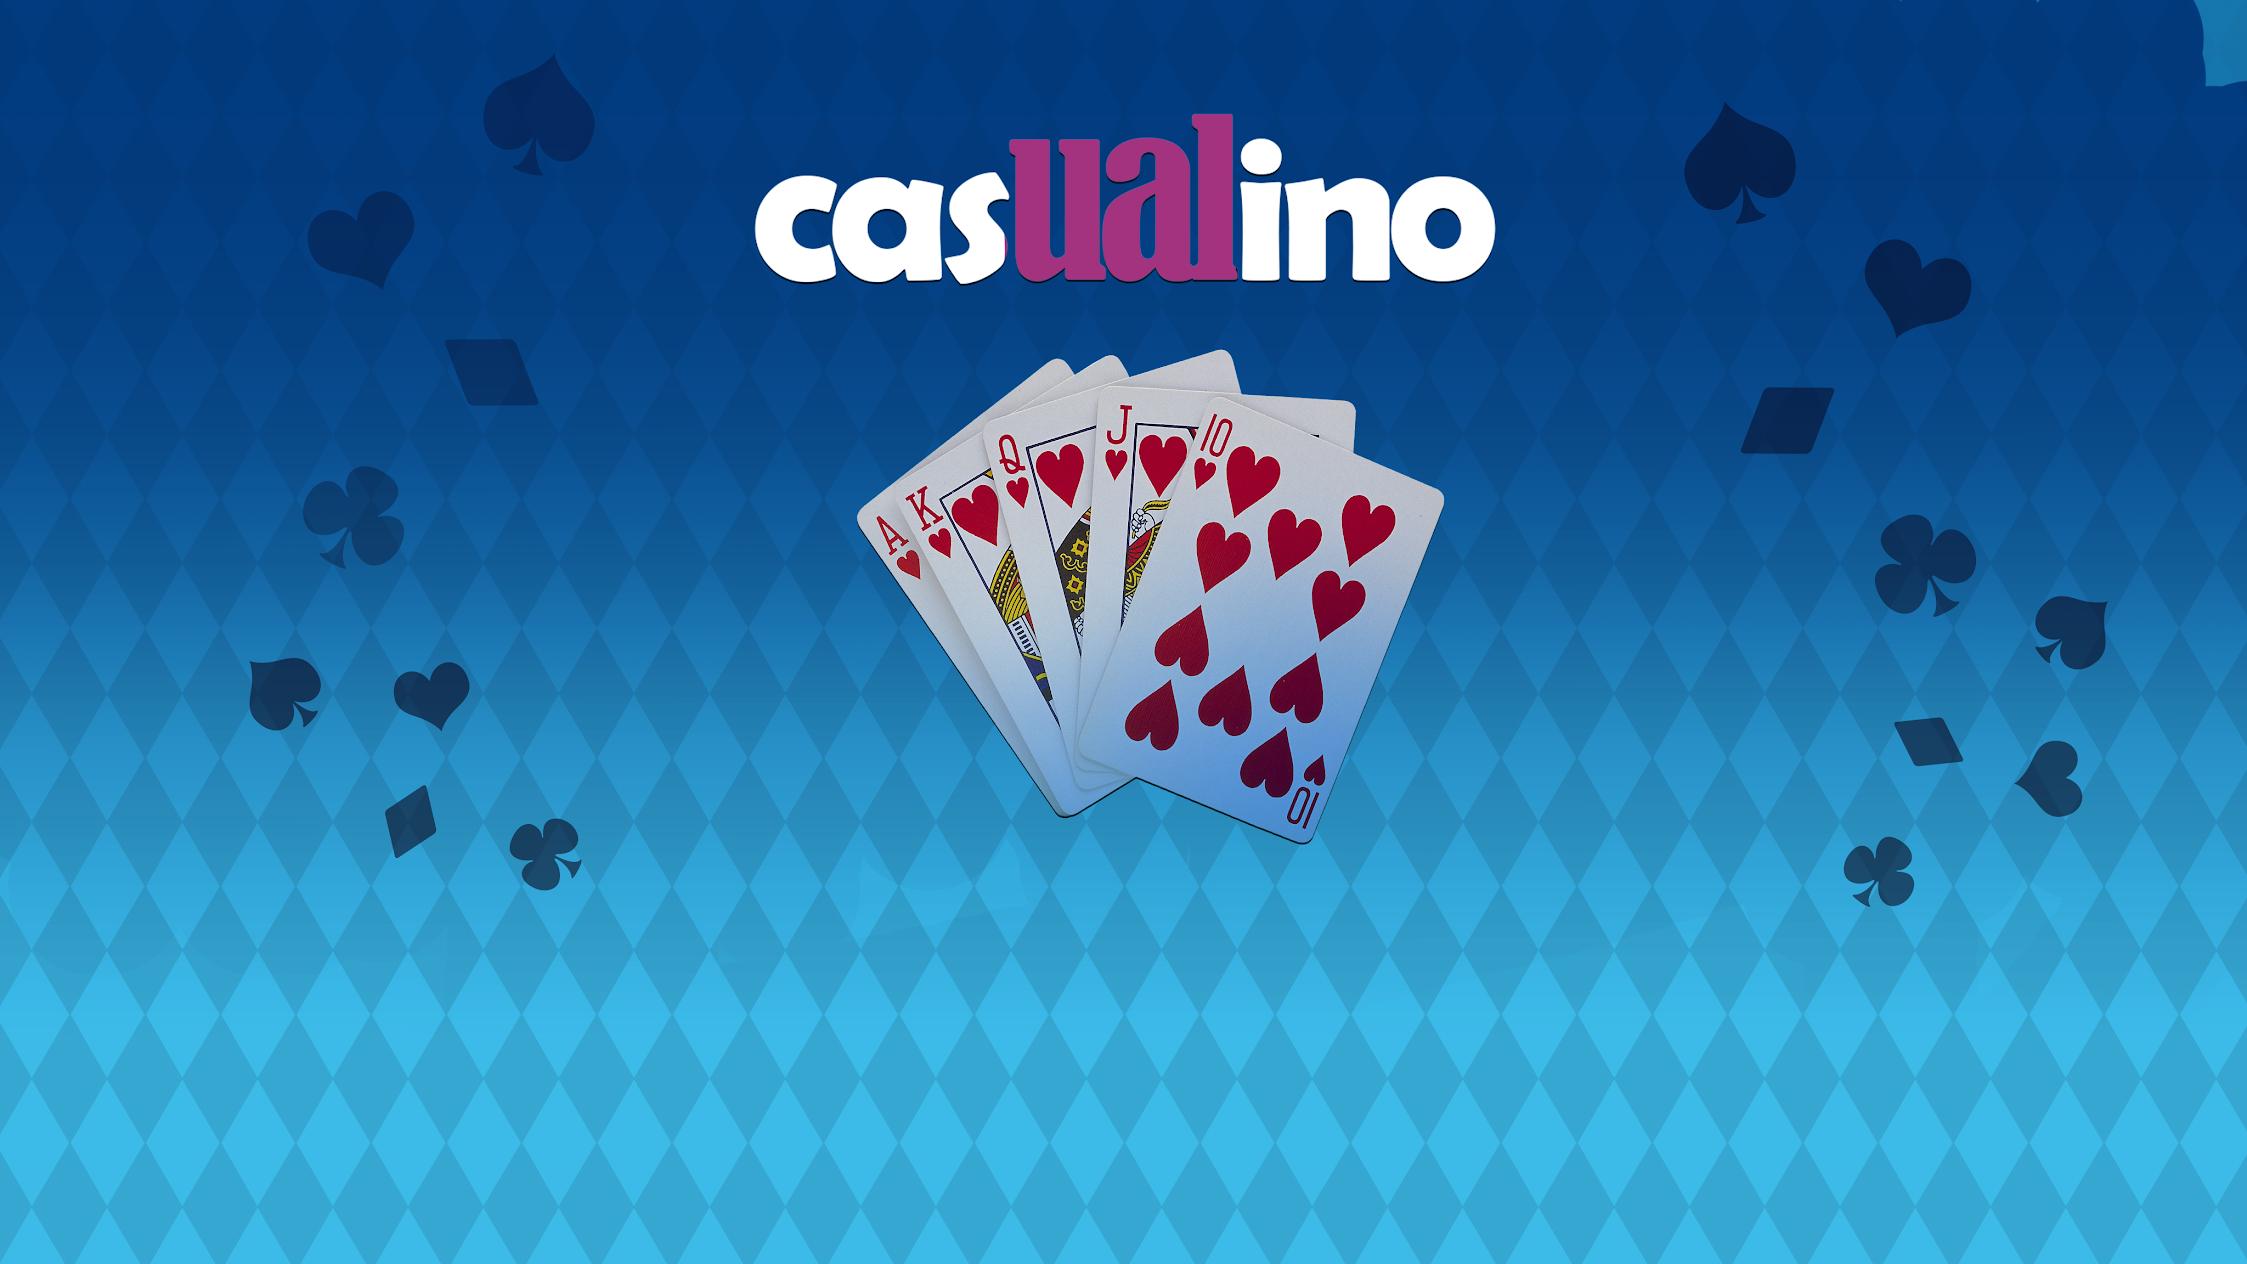 Casualino Games